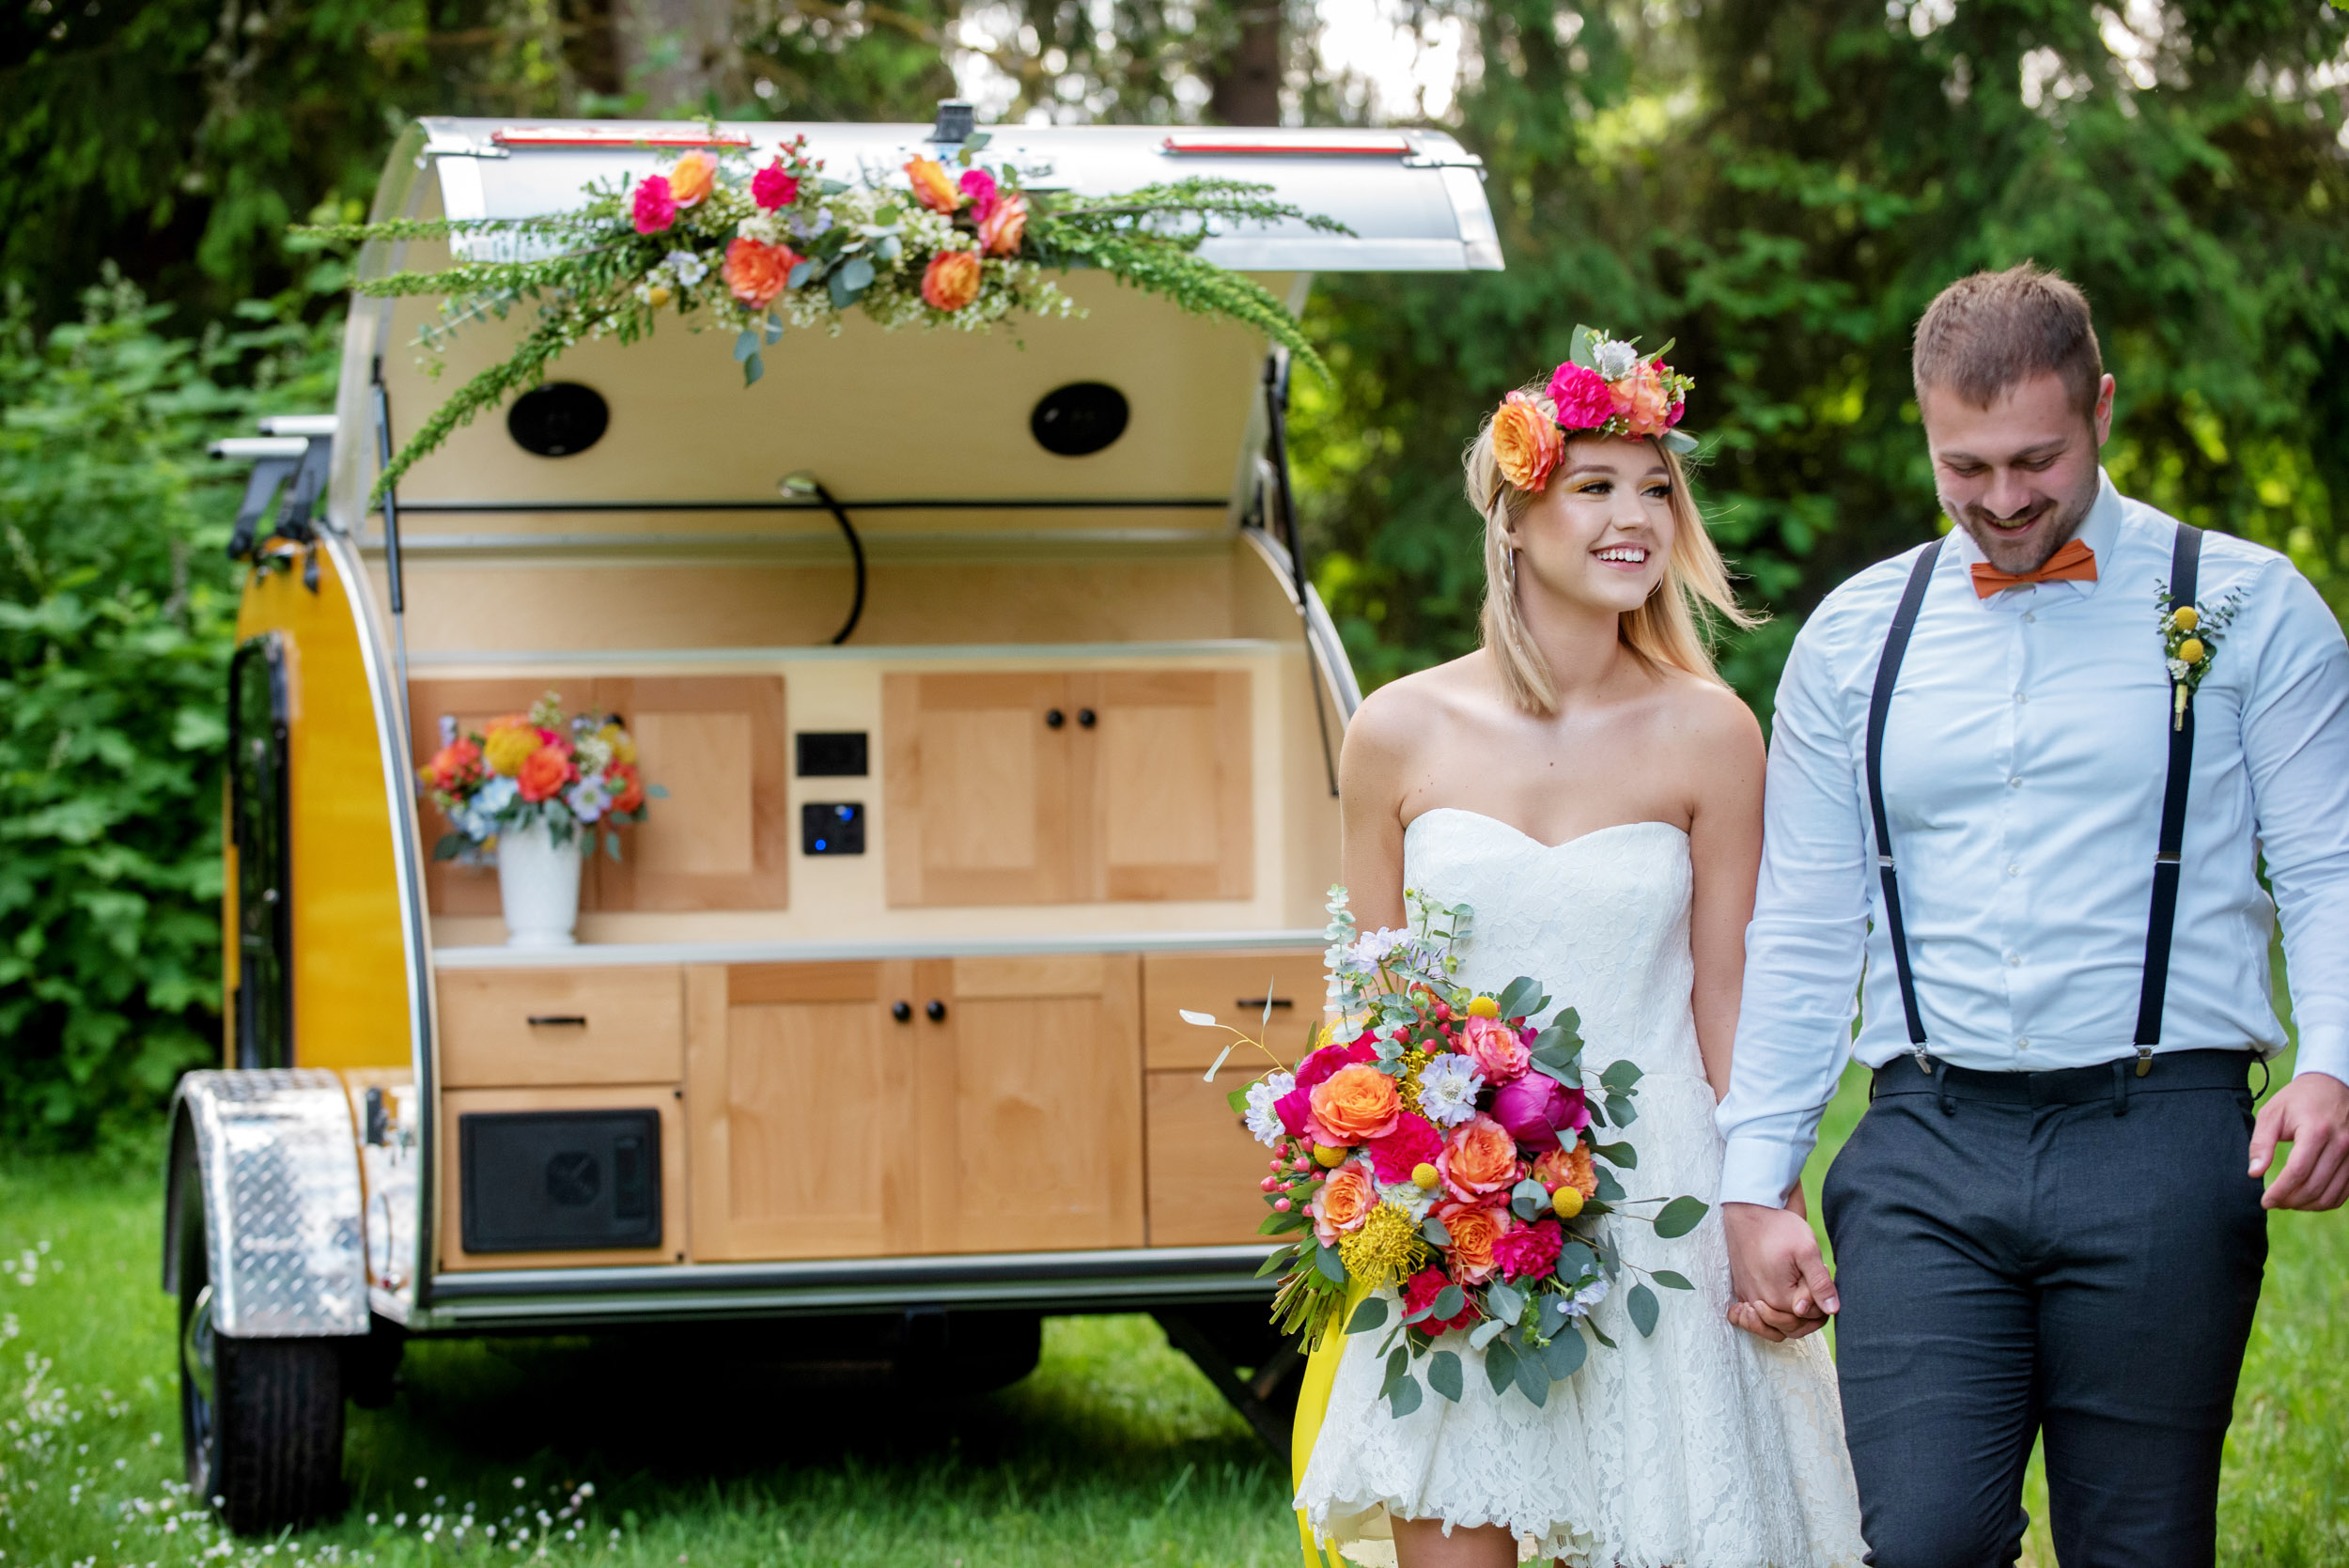 bride bouquet, bridal bouquet, bride and groom, adventure elopement, adventure wedding, camping wedding, Oregon outdoor wedding, elopement wedding, Pacific Northwest wedding, wedding photography